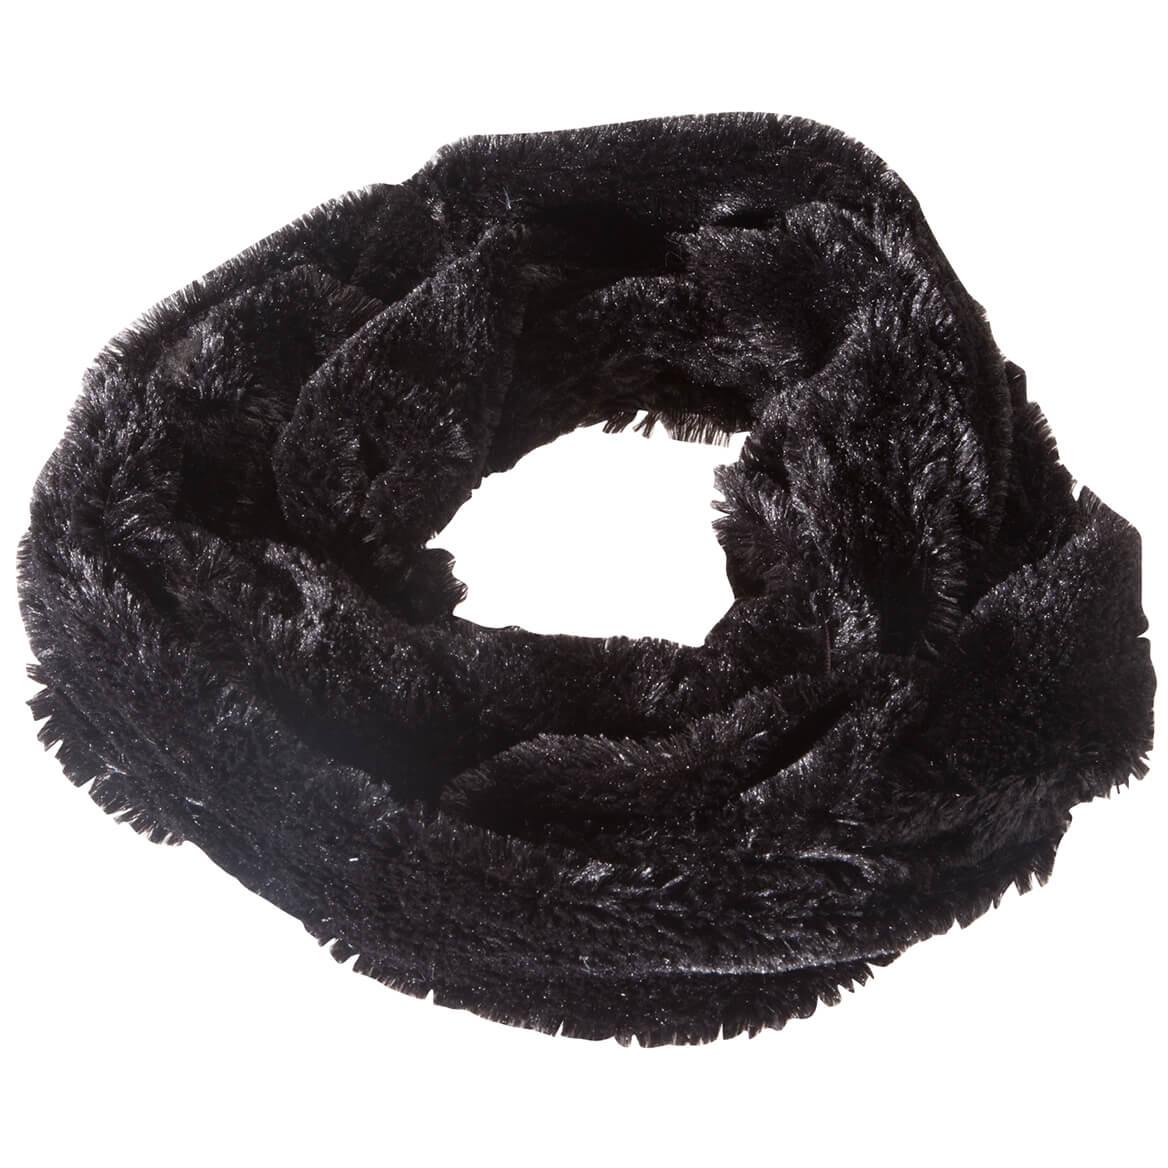 Faux Fur Infinity Scarf